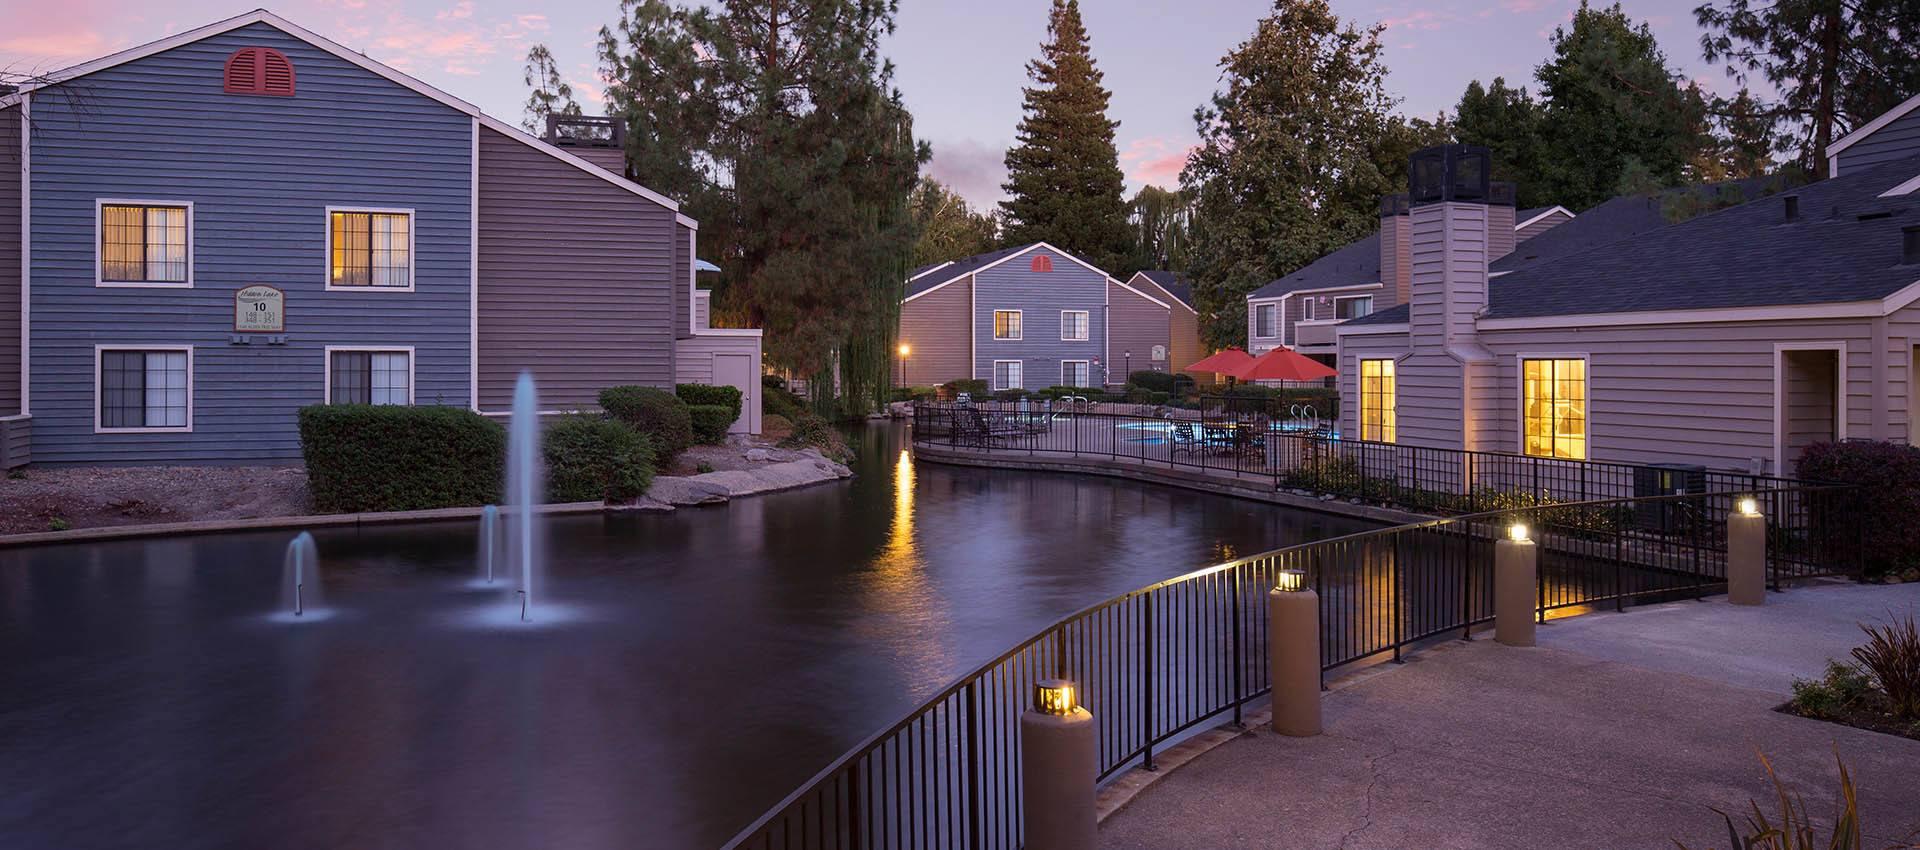 Serene Lakes & Fountains at Hidden Lake Condominium Rentals in Sacramento, California